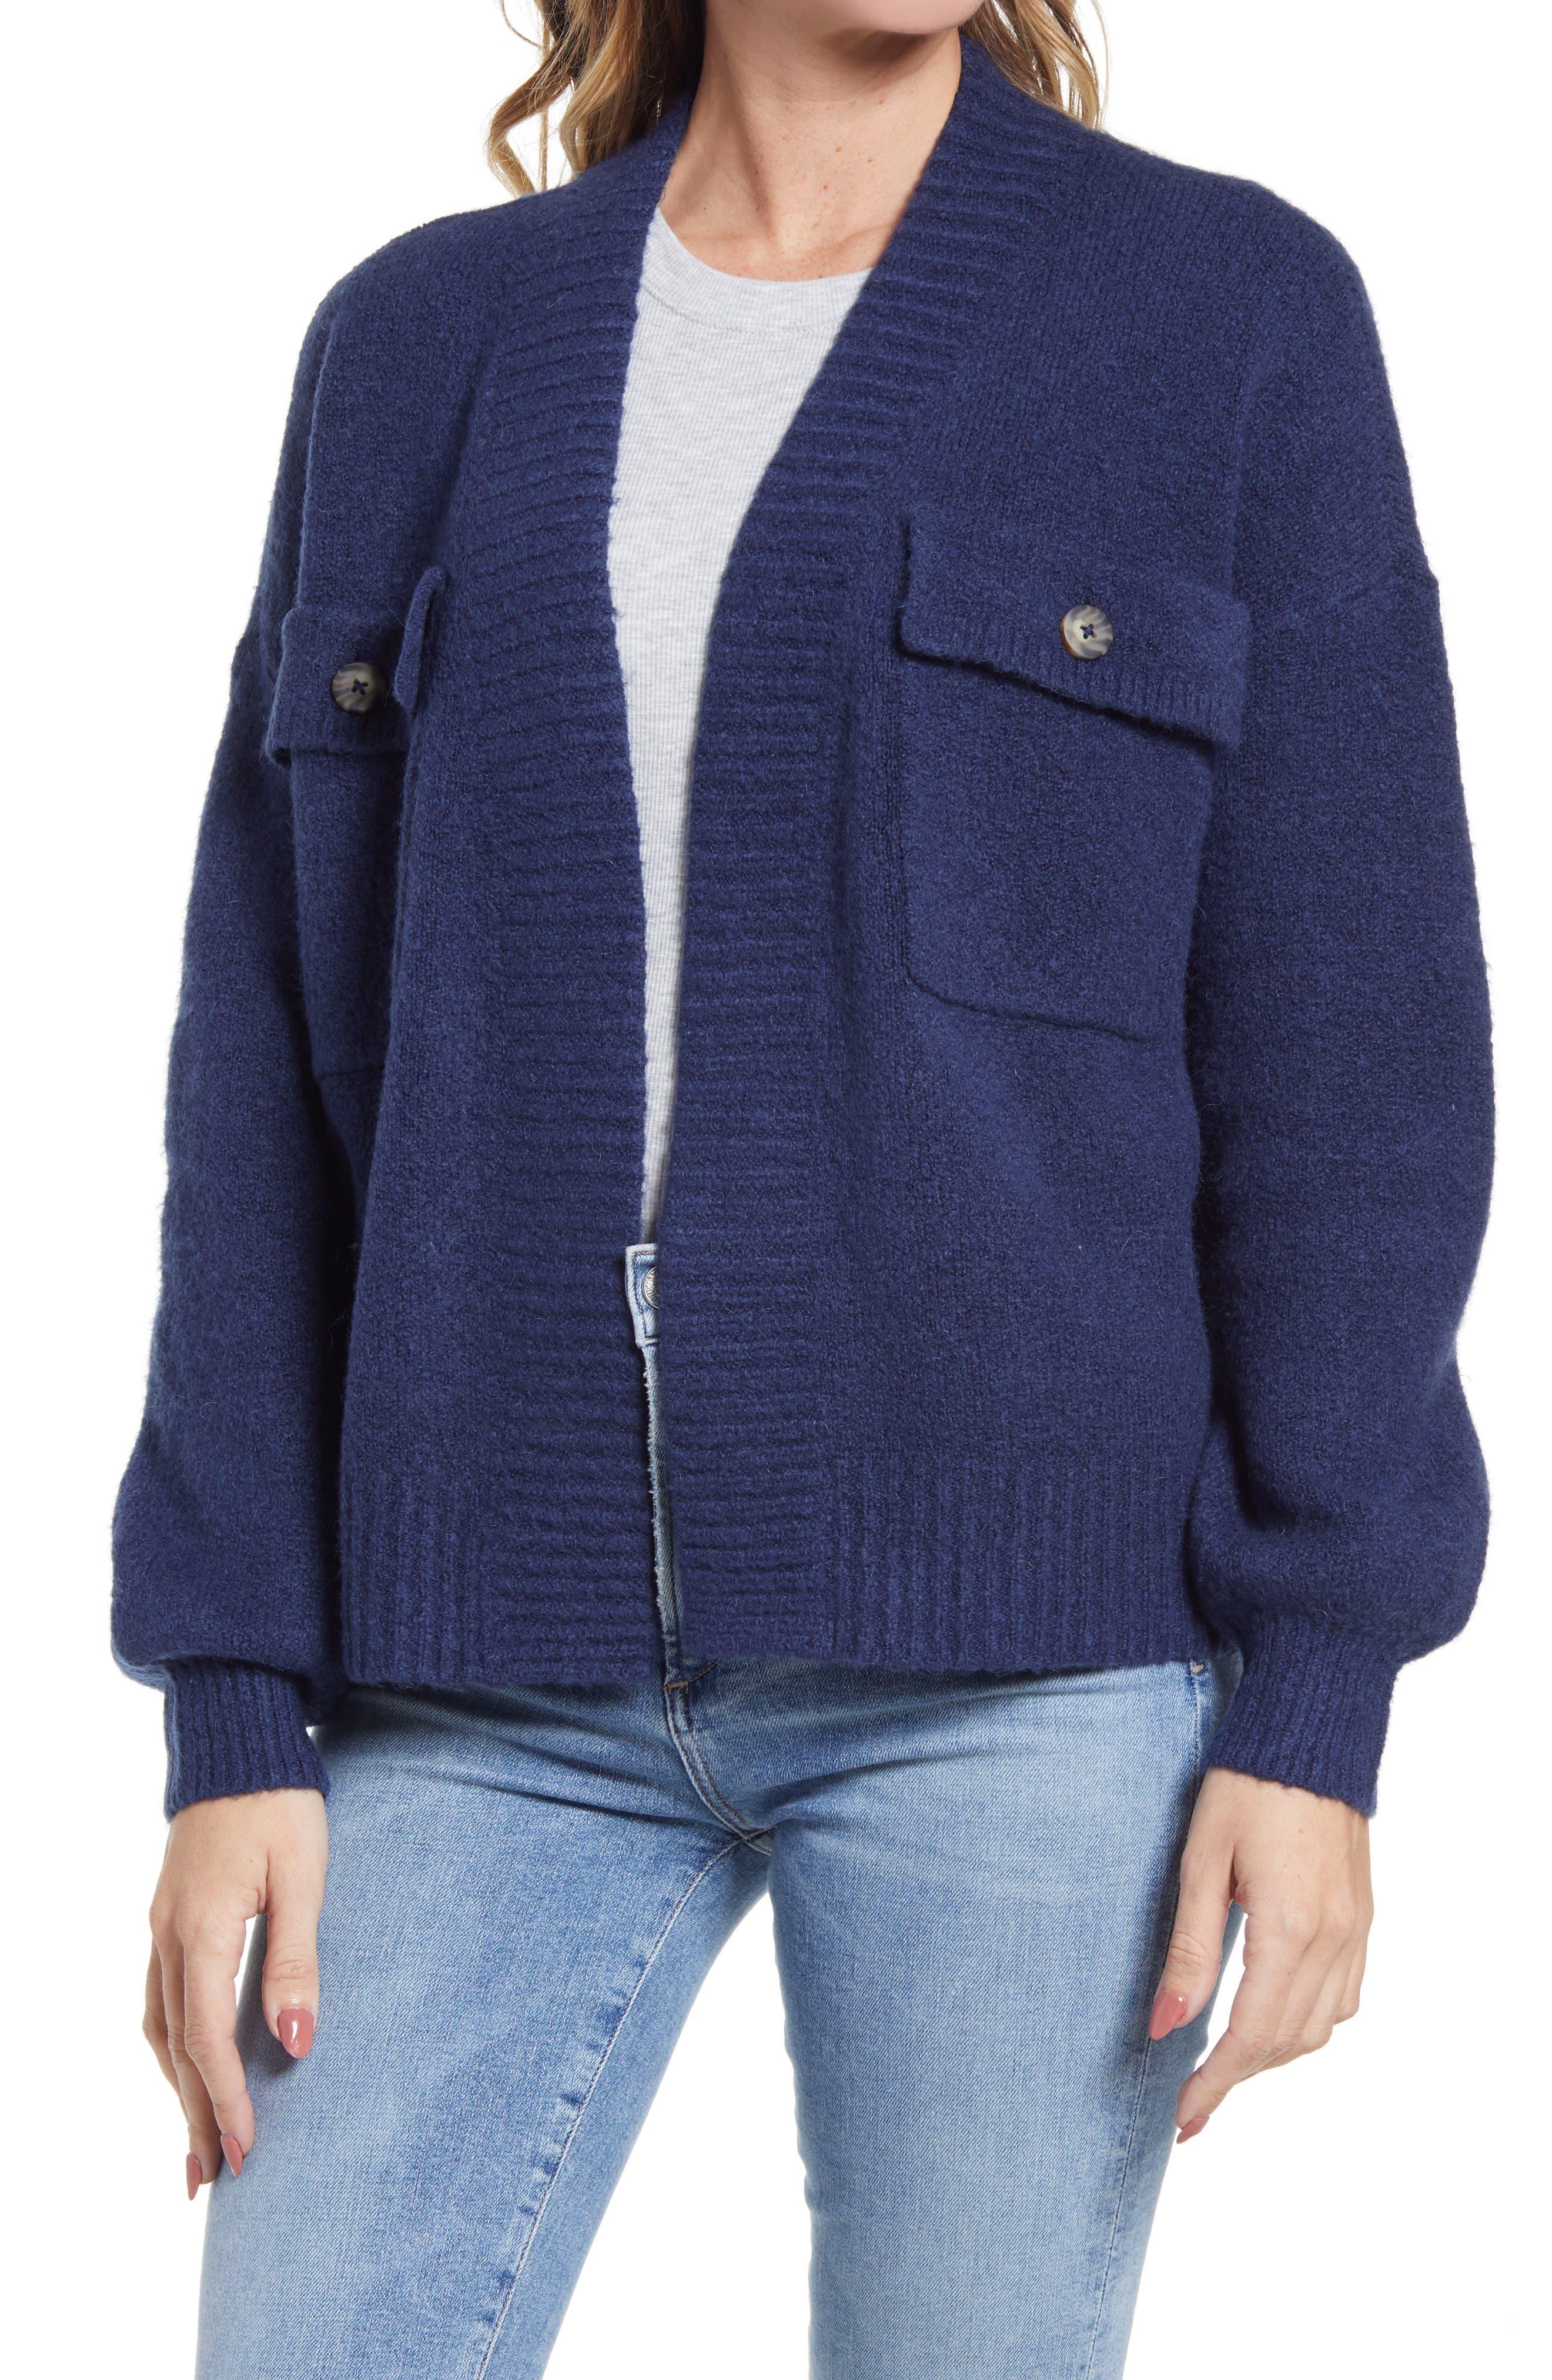 Madewell Cargo Cardigan Sweater | Nordstrom